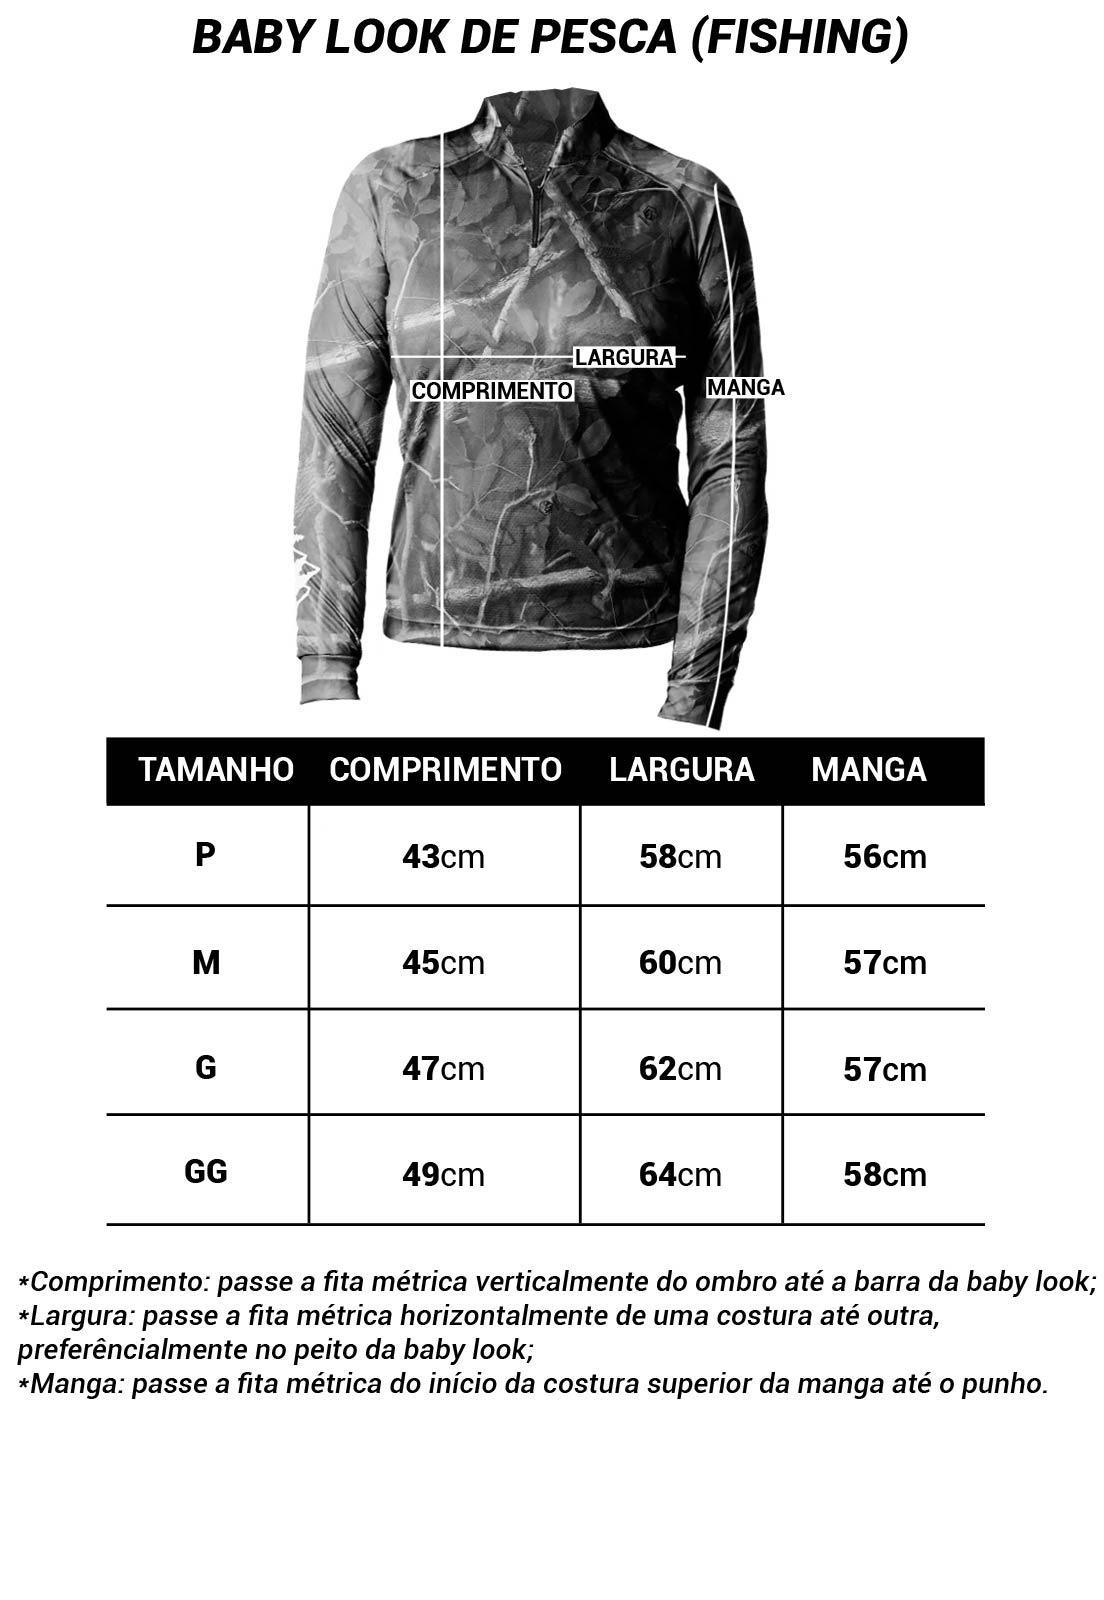 CAMISA DE PESCA FISH TECH PRO 29 FEMININA + BANDANA GRÁTIS  - Real Hunter